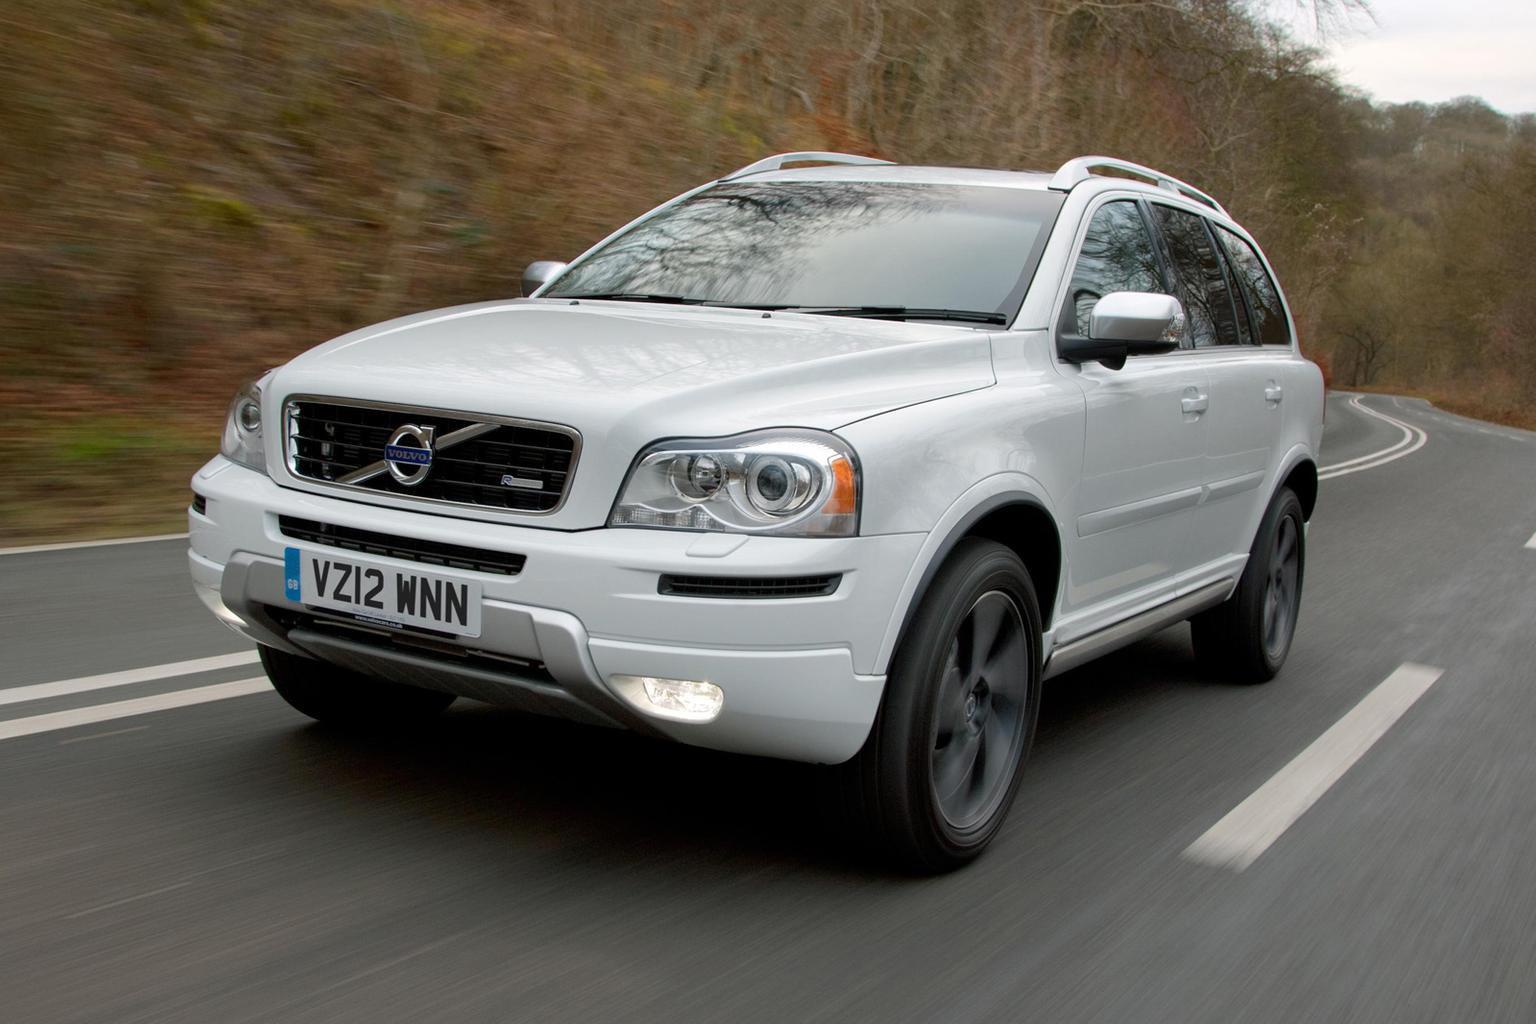 Massive savings on current-model Volvo XC90s